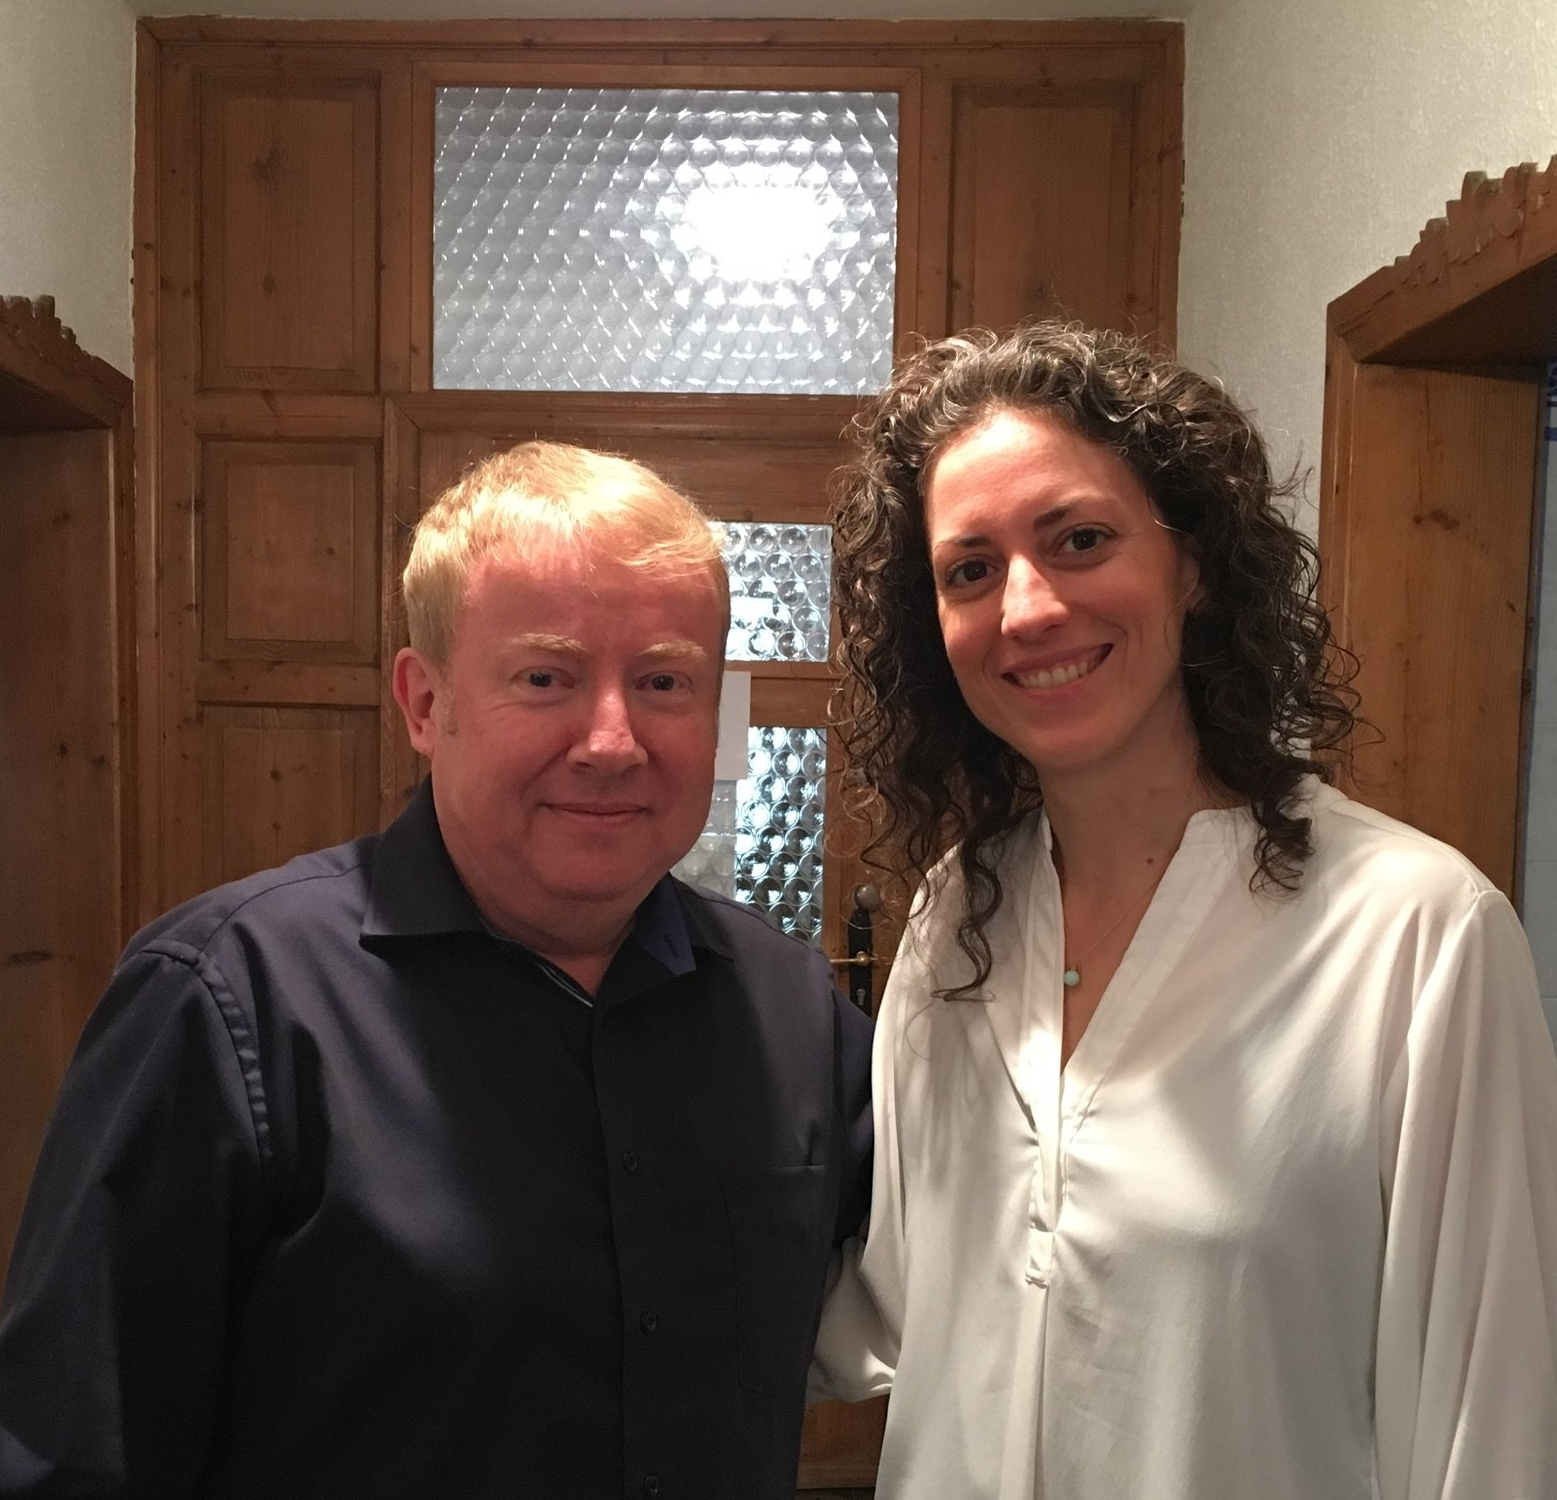 Dr. Frank Daudert and Colleen Flowers in December 2017